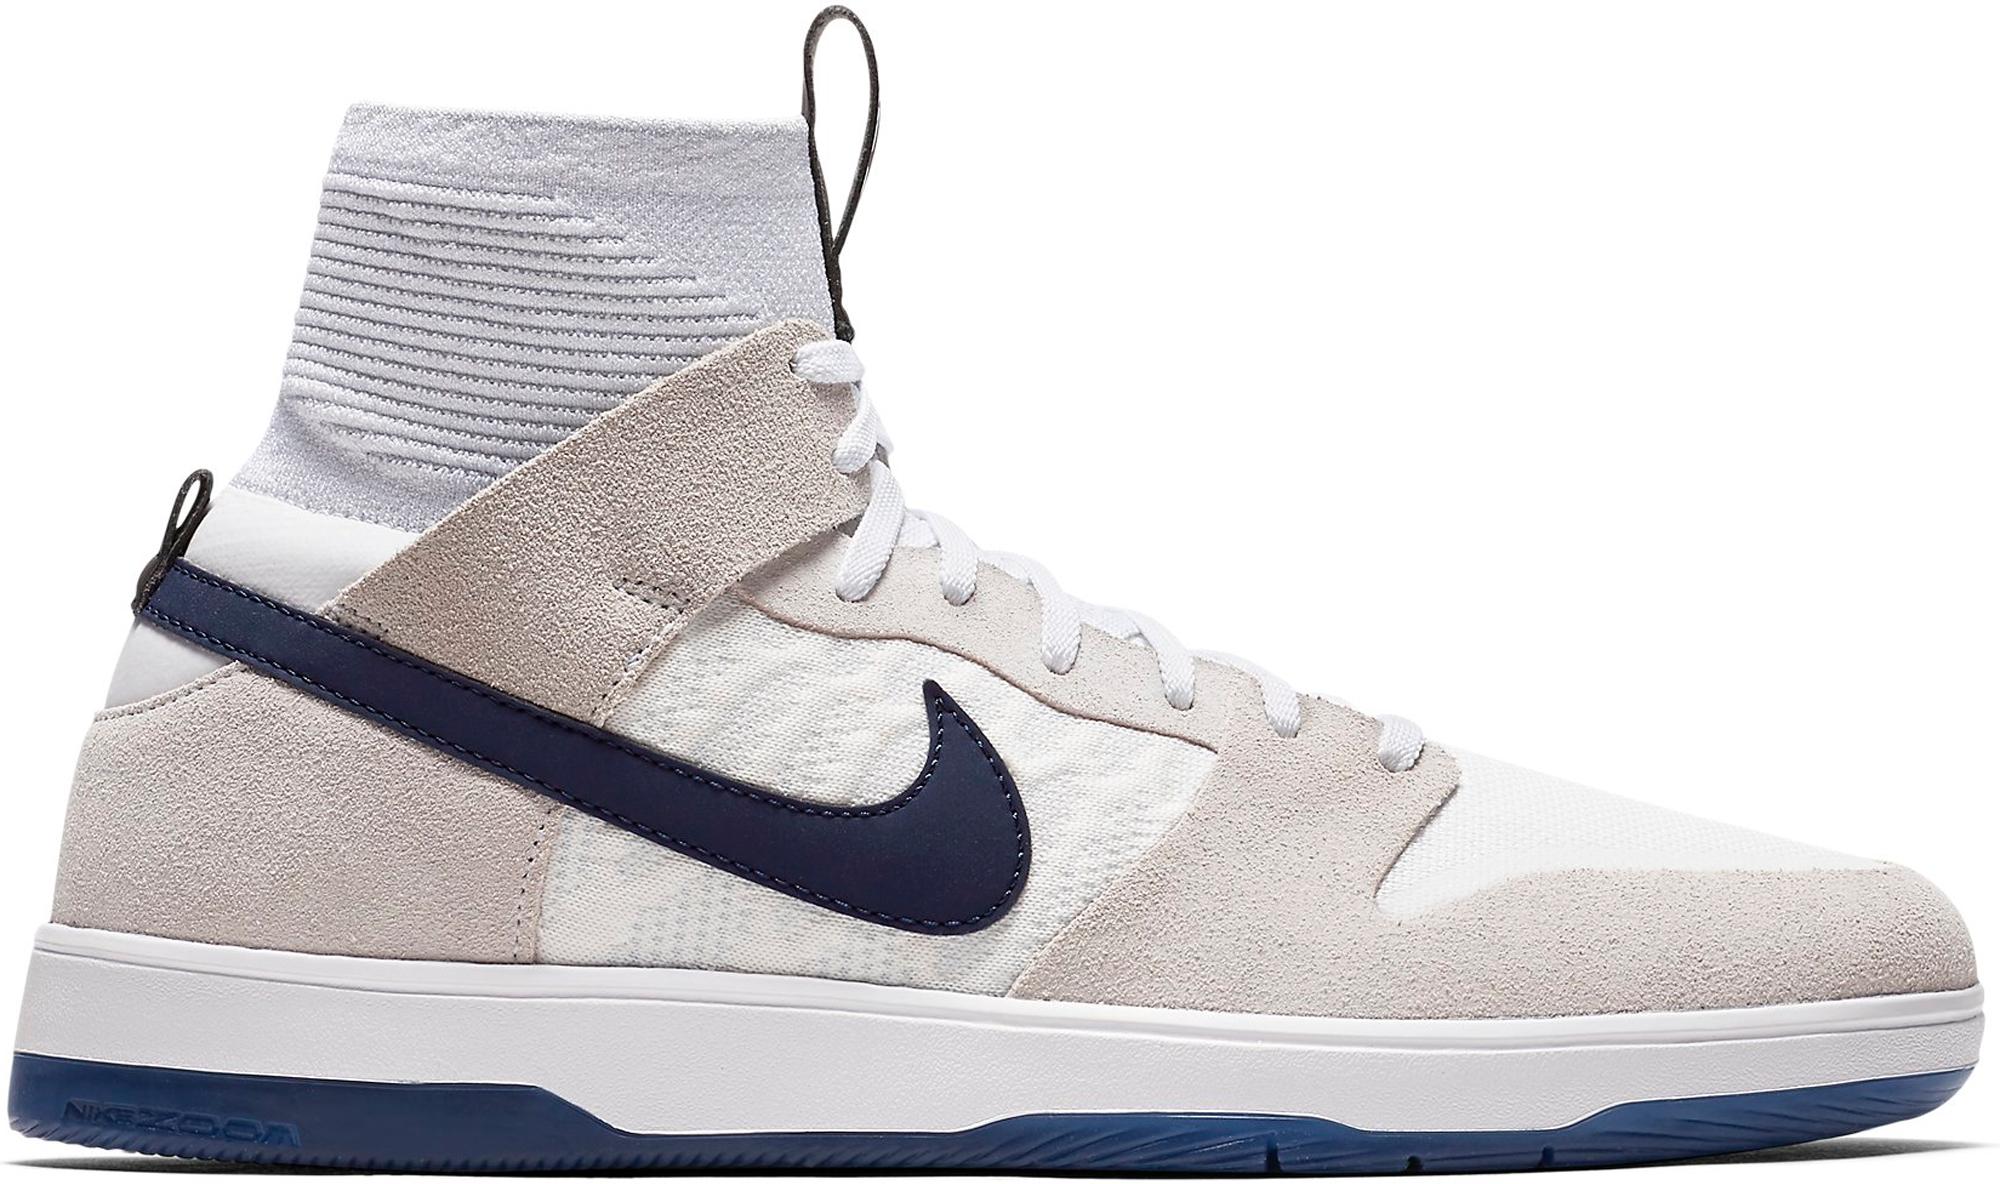 Nike SB Dunk High Elite Cyrus Bennett